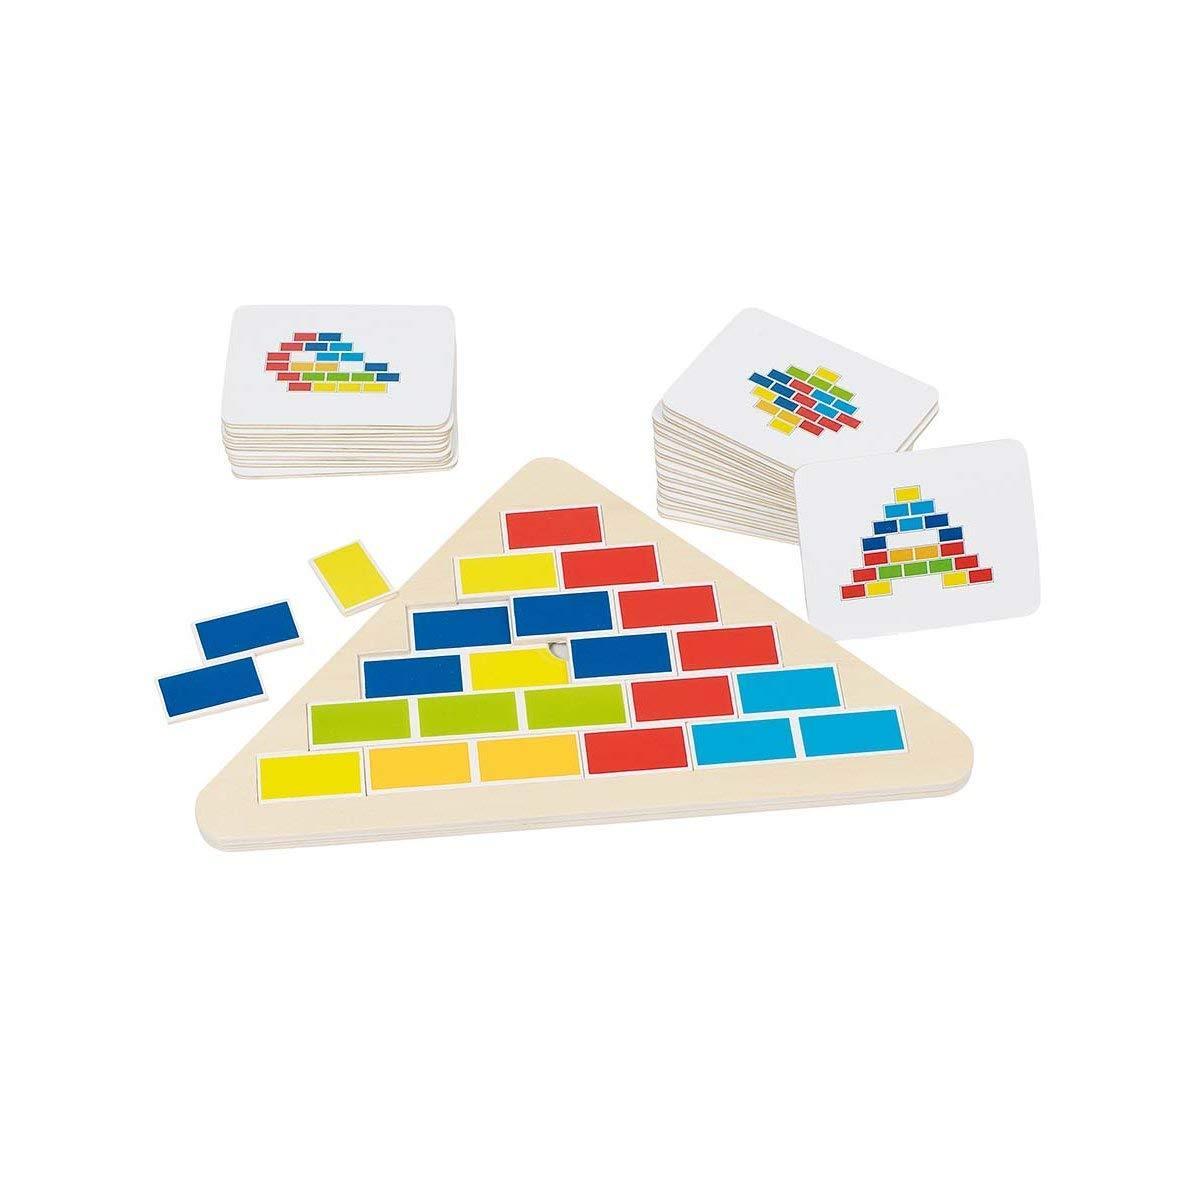 Игра-головоломка goki Треугольник (57924G) фото